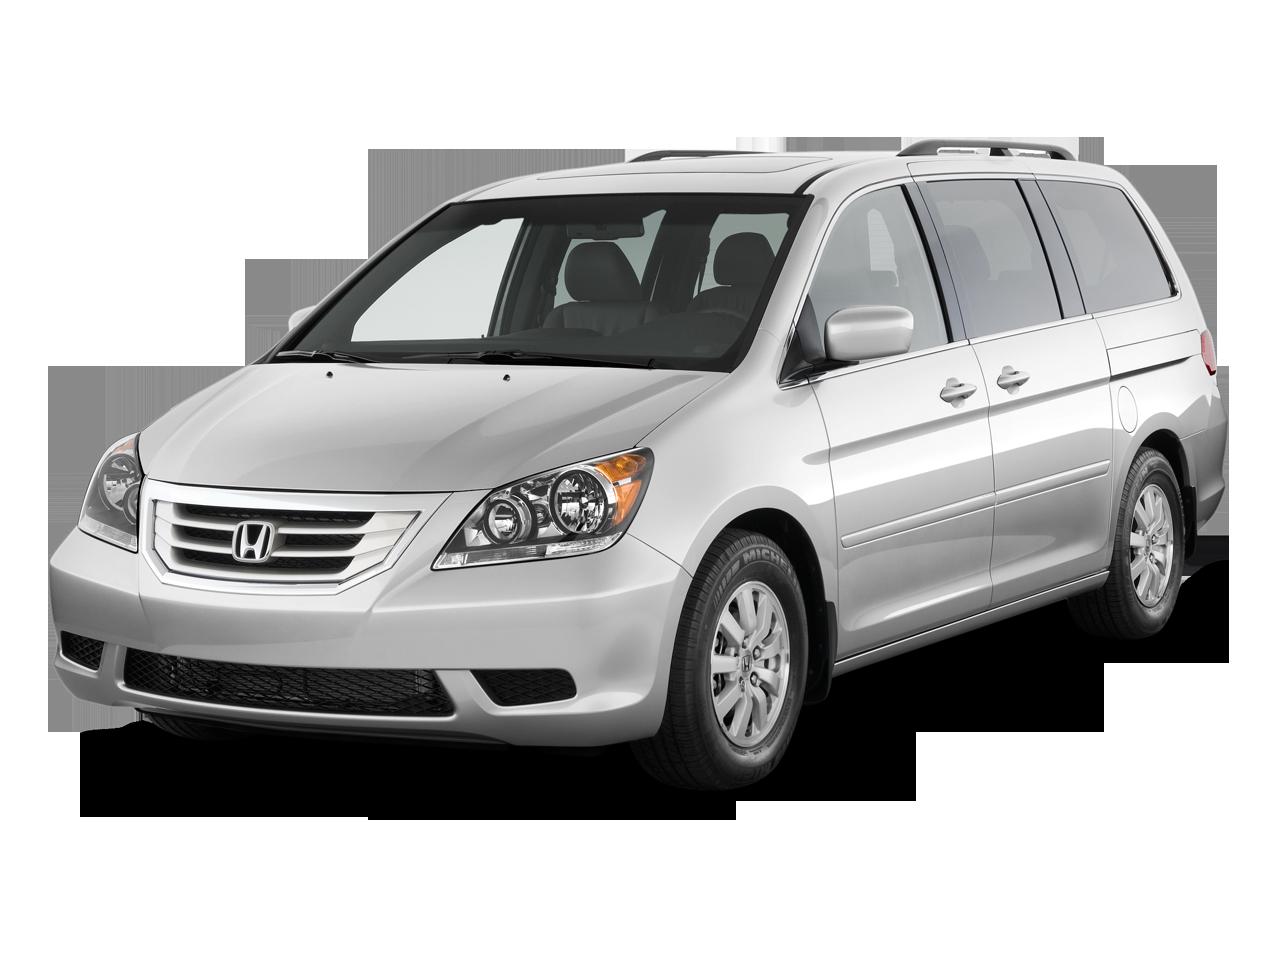 2009 honda odyssey touring honda minivan review automobile magazine. Black Bedroom Furniture Sets. Home Design Ideas